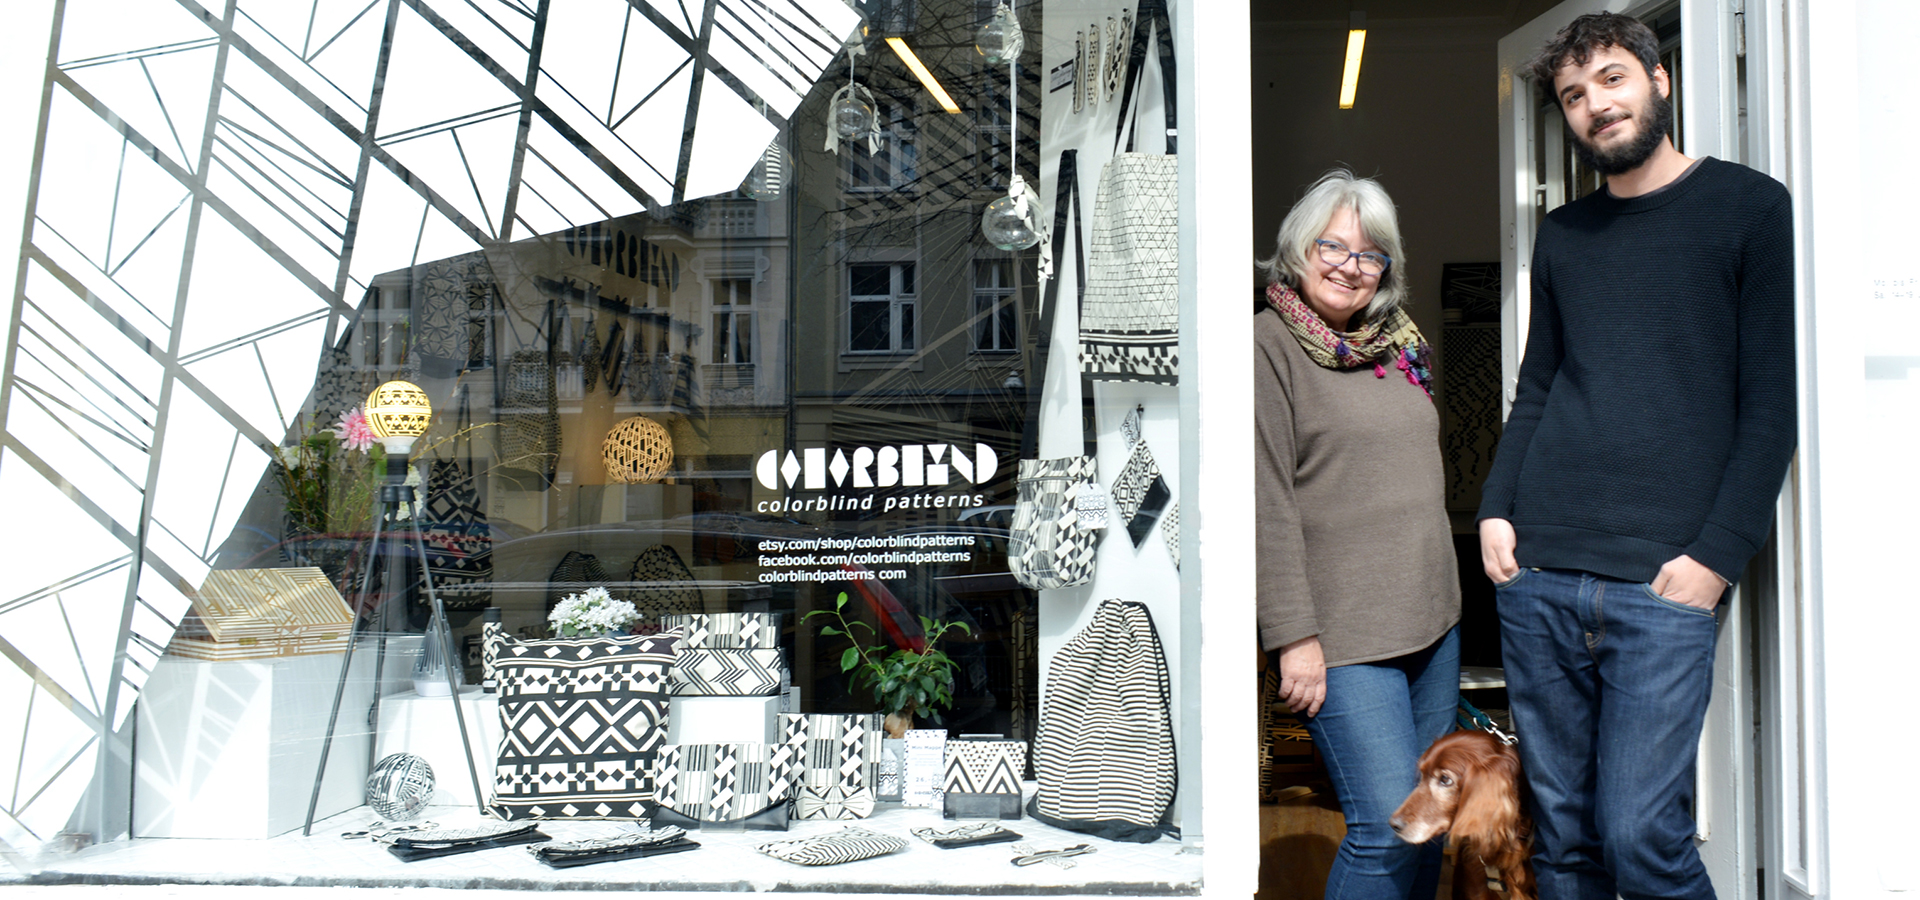 laden schaufenster design deko artkdeko kunst muster kalligraphie in berlin wedding schwarz weiß